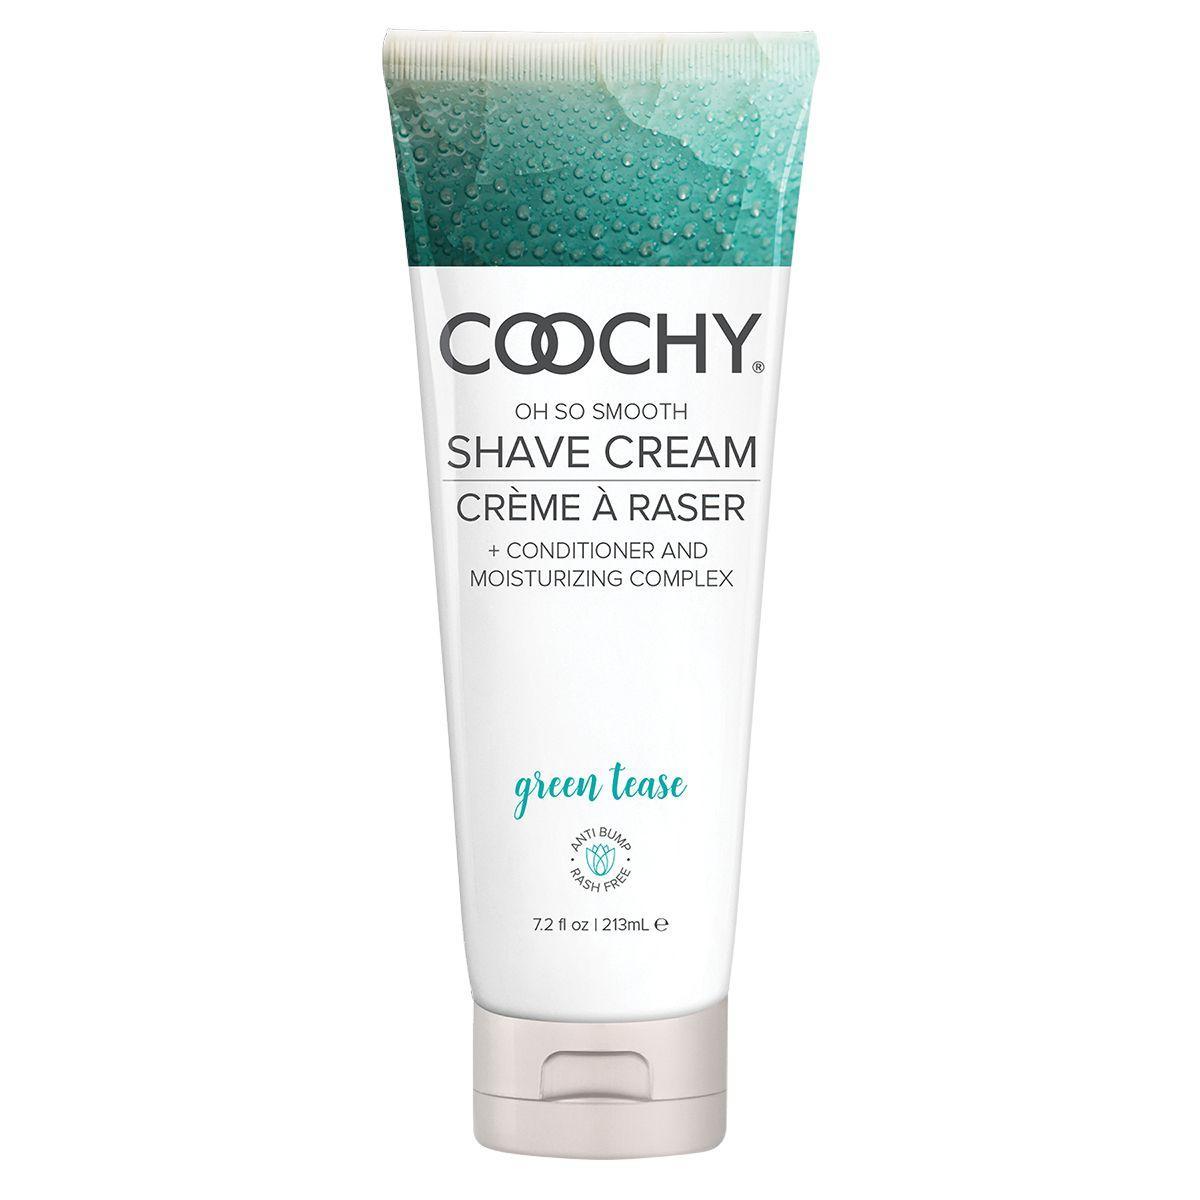 Увлажняющий комплекс COOCHY Green Tease - 213 мл.-7580